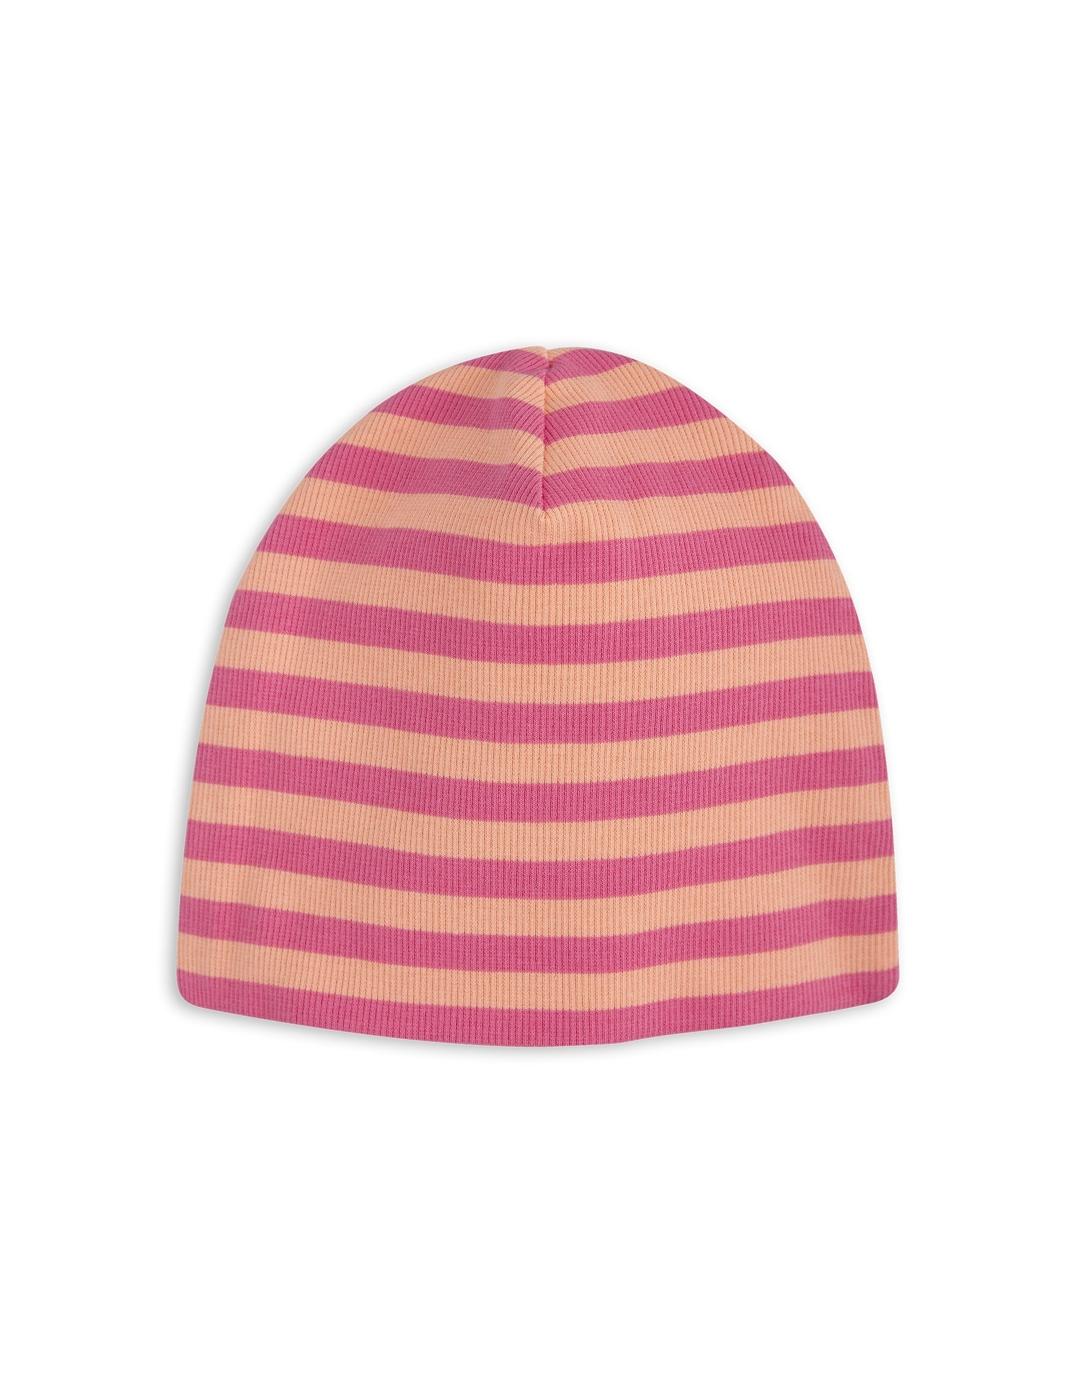 1776515333 2 mini rodini stripe rib beanie pink